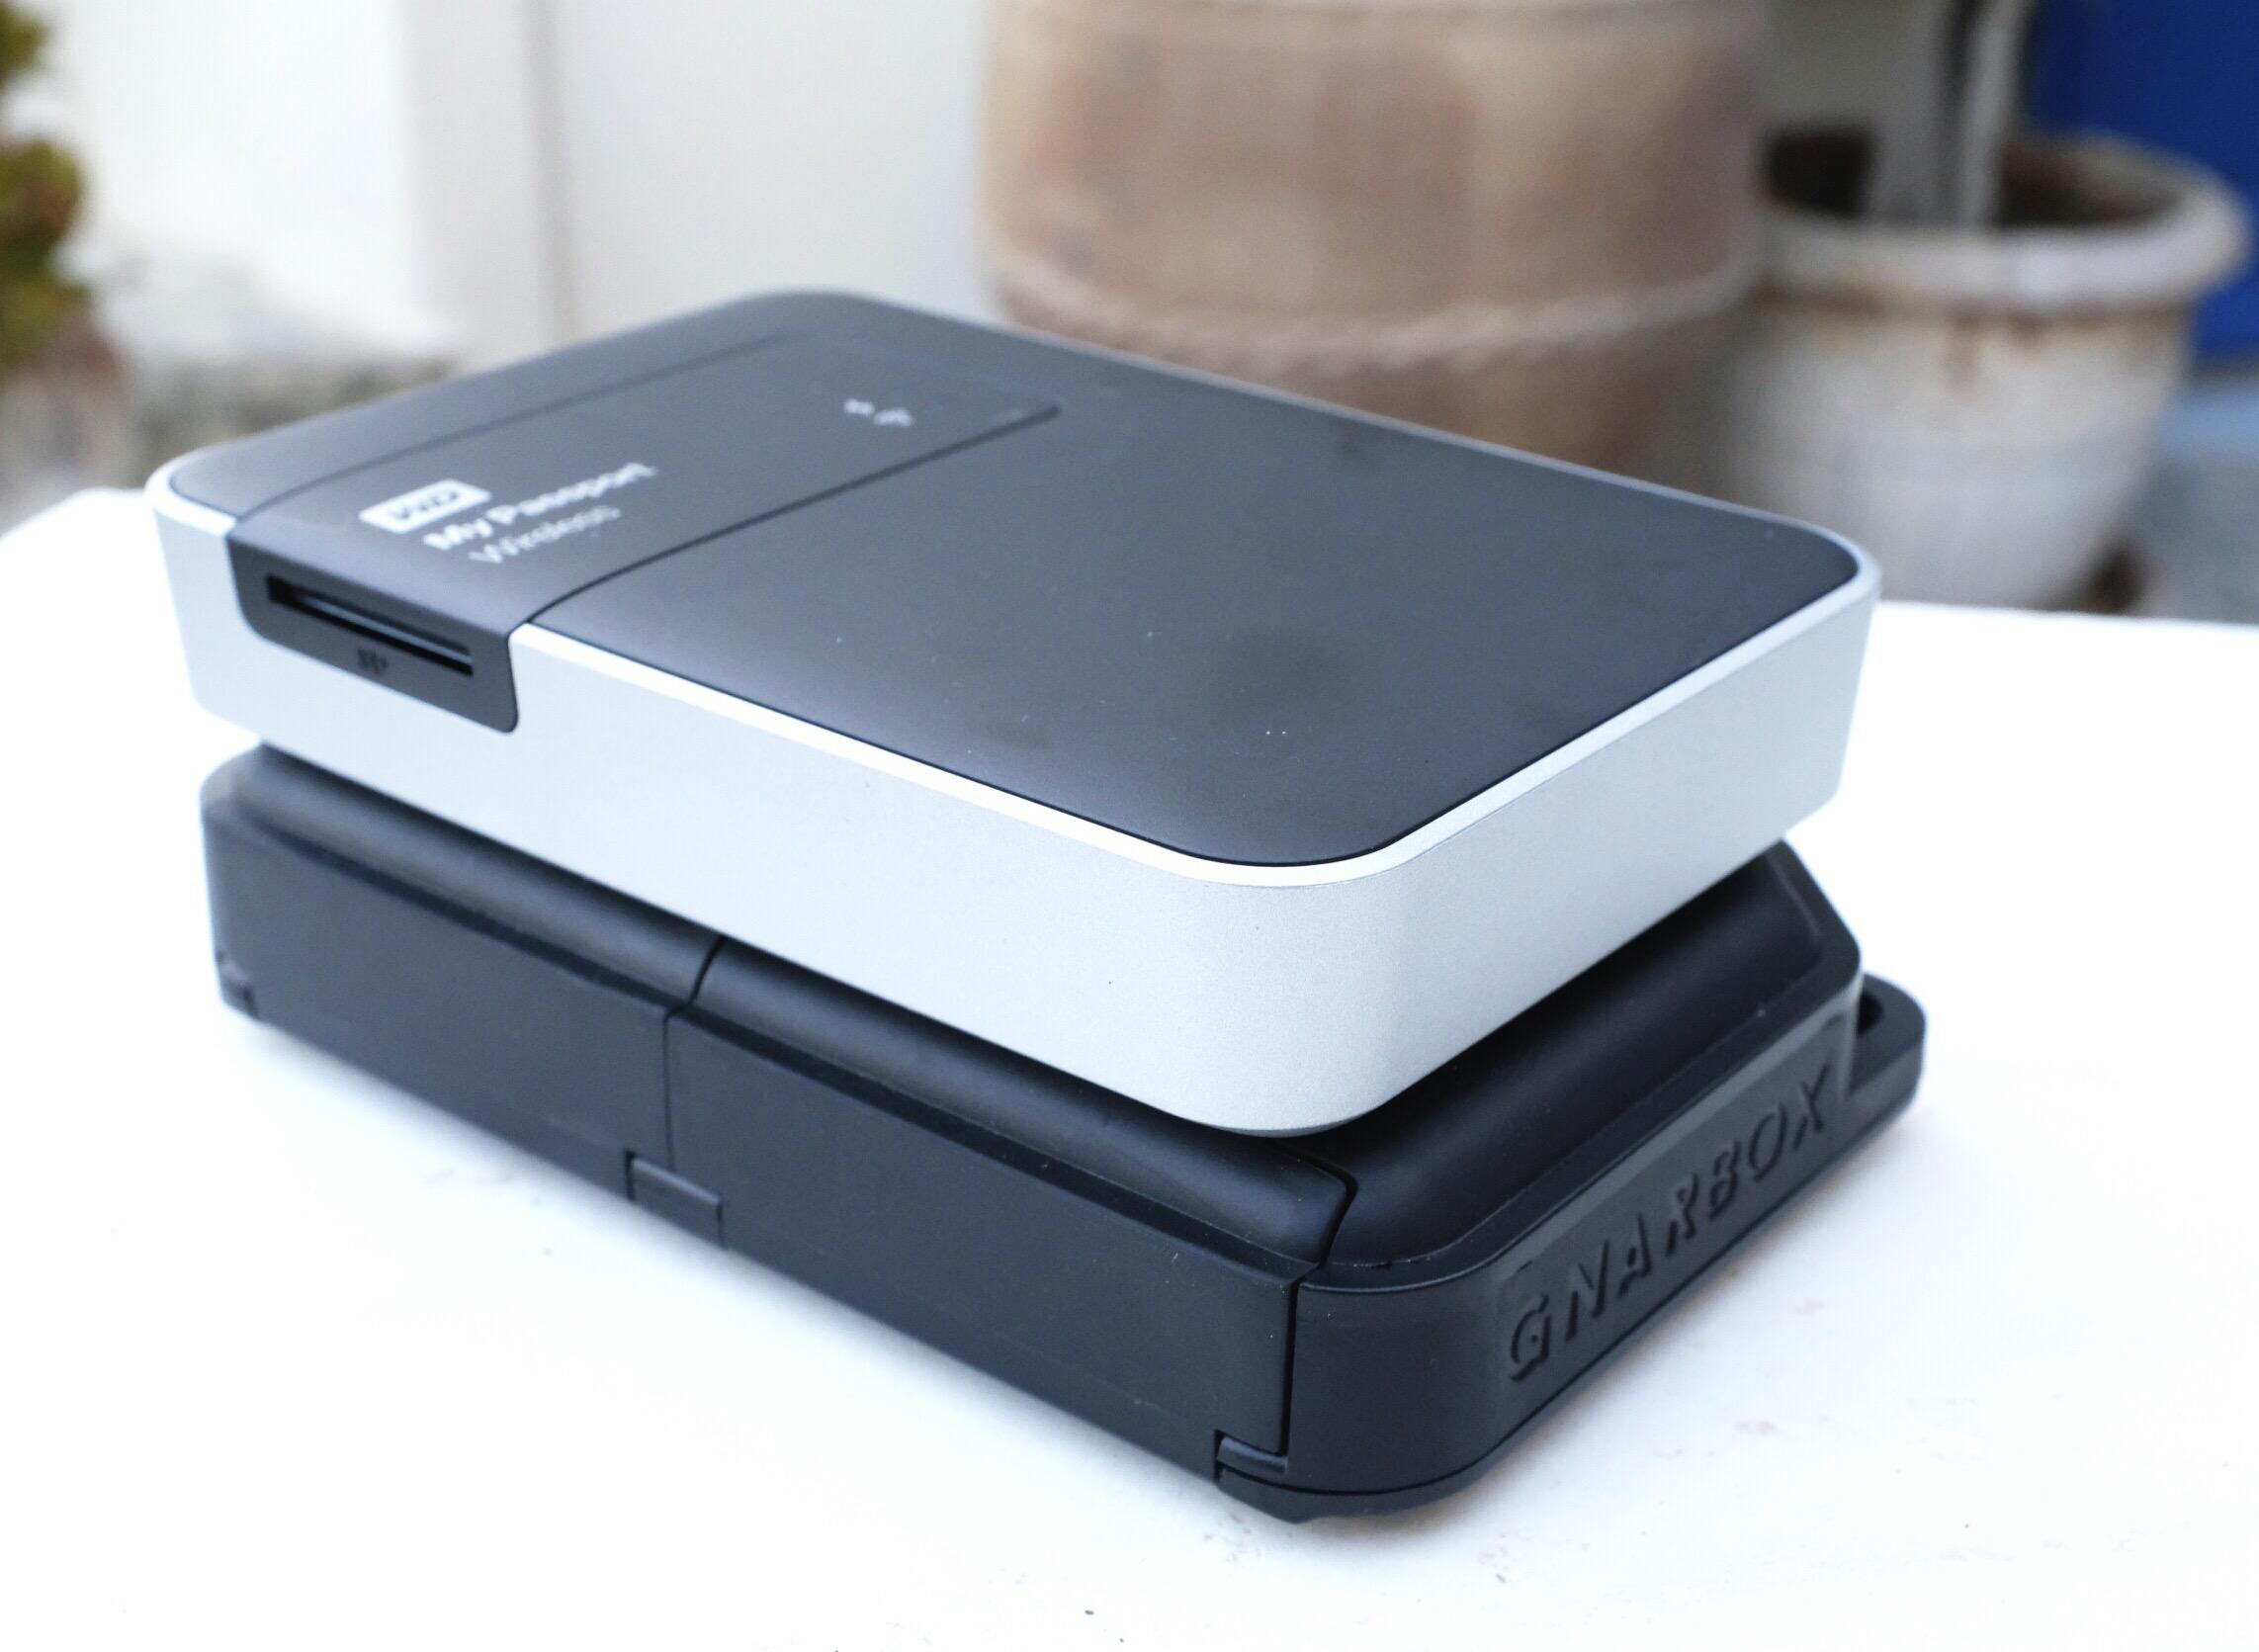 Gnarbox, WD My Passport Wireless